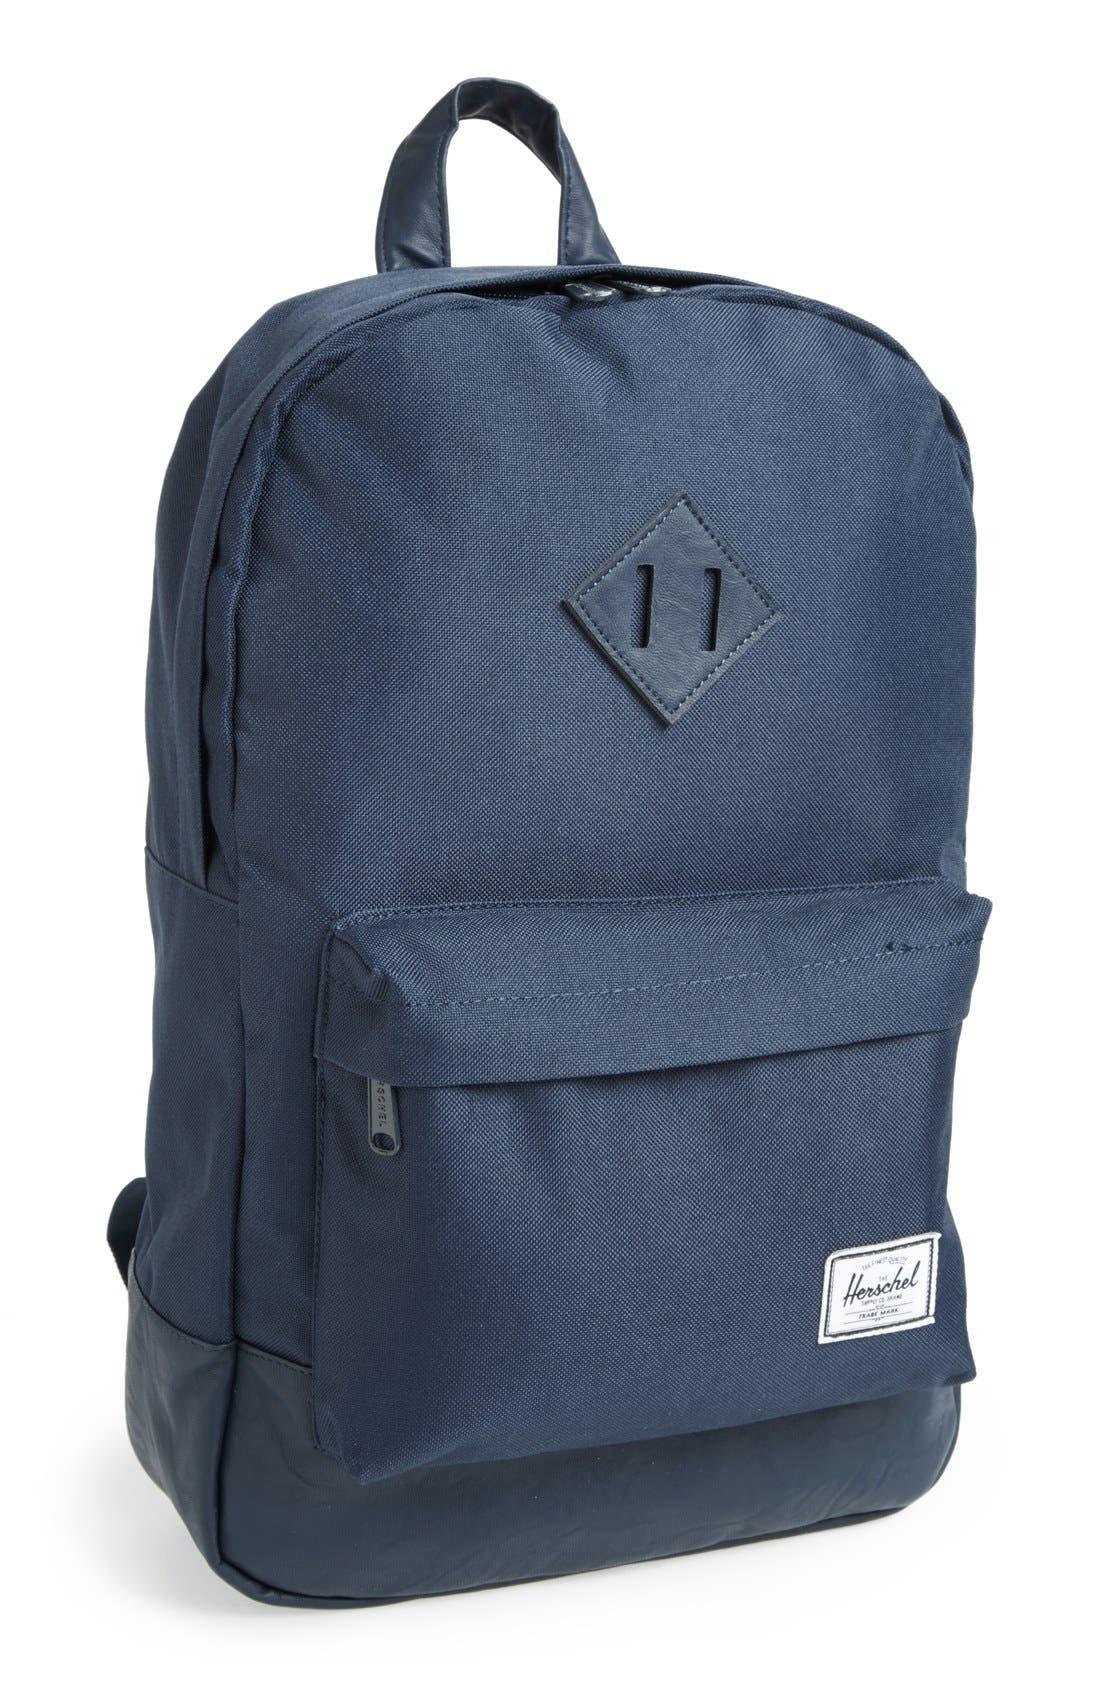 Alternate Image 1 Selected - Herschel Supply Co. 'Heritage - Medium' Backpack